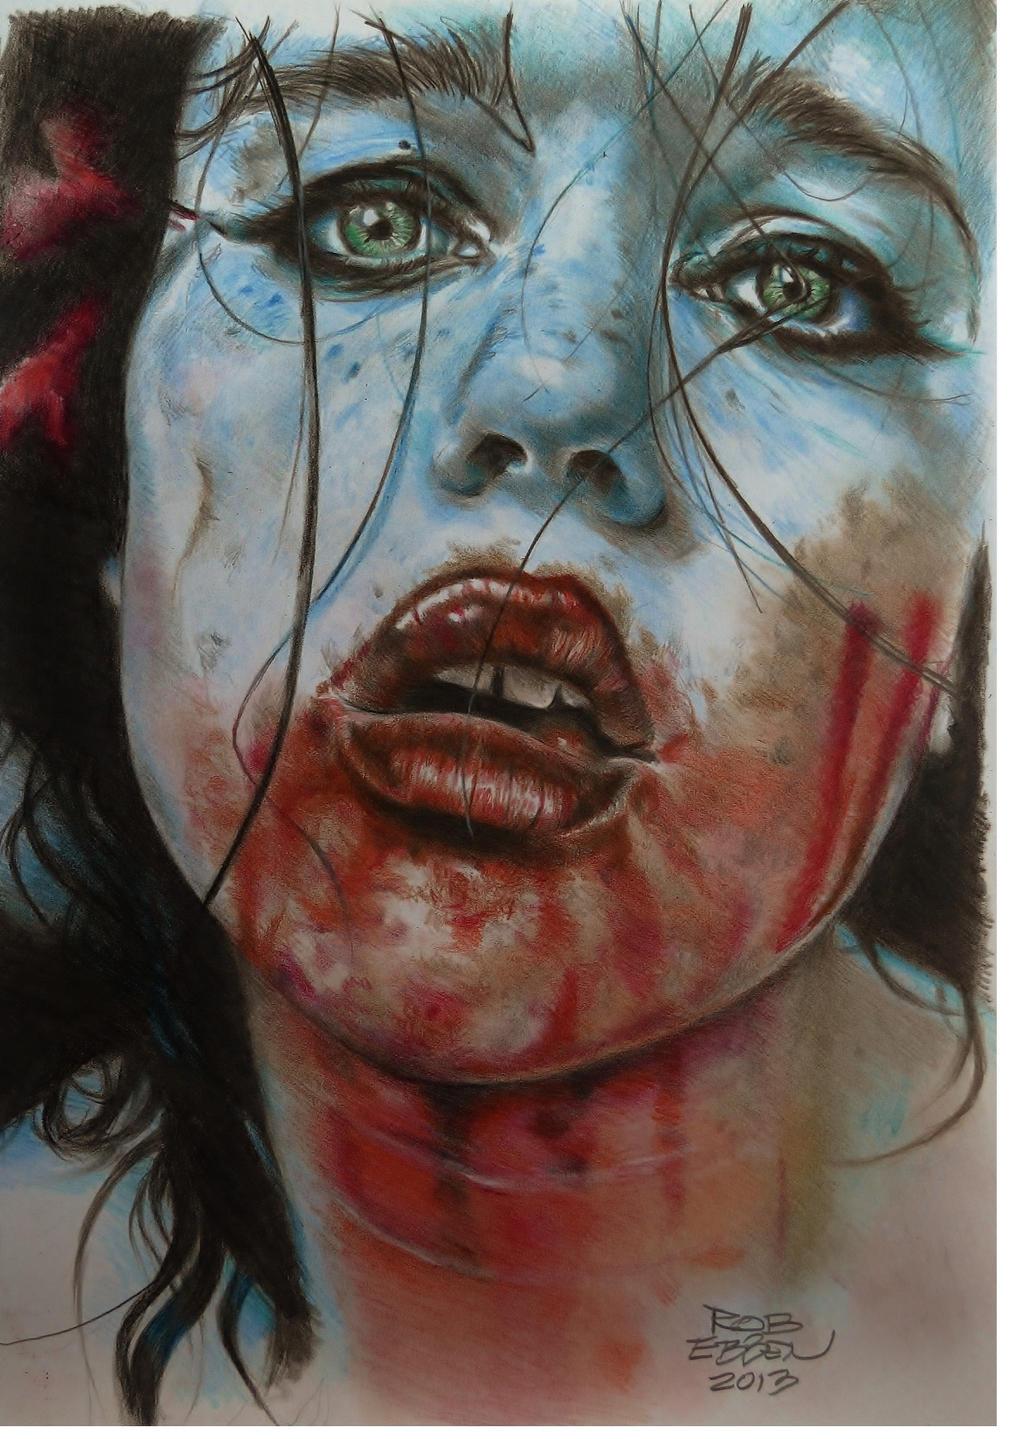 Cristina Otero's Remorse by MrEyeCandy66